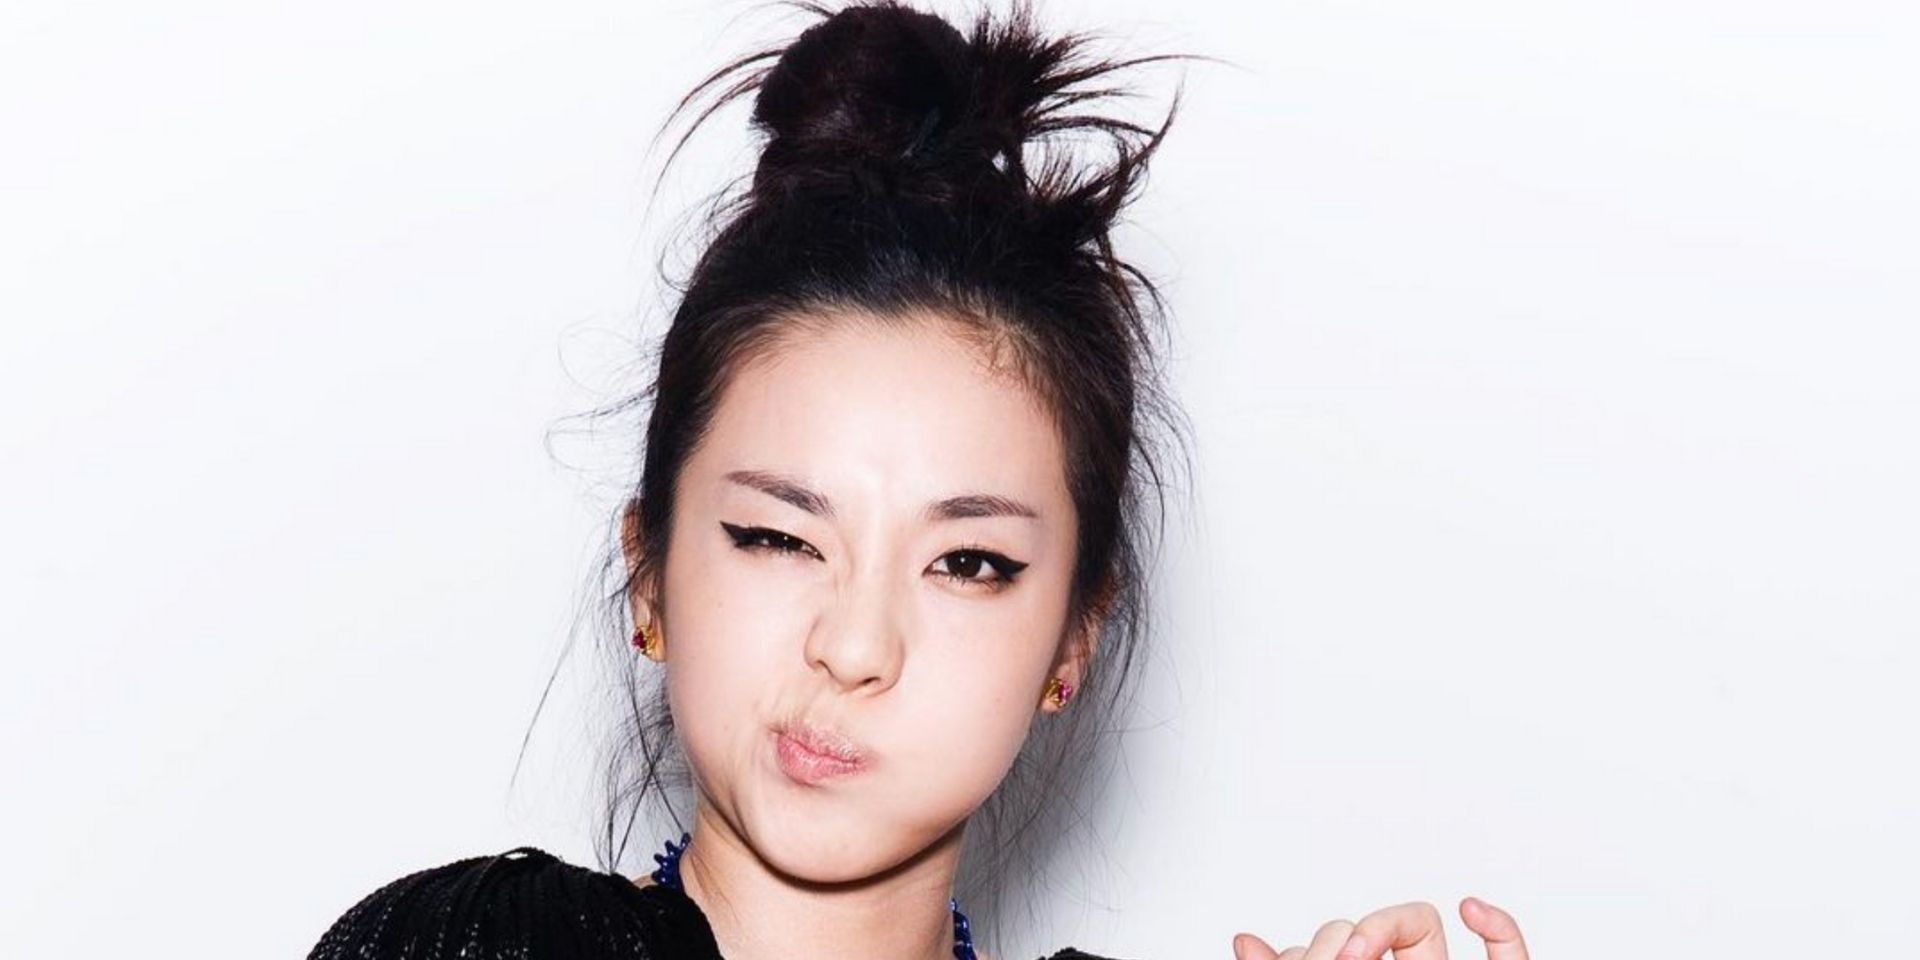 Former 2NE1 member Sandara Park leaves YG Entertainment after 17 years